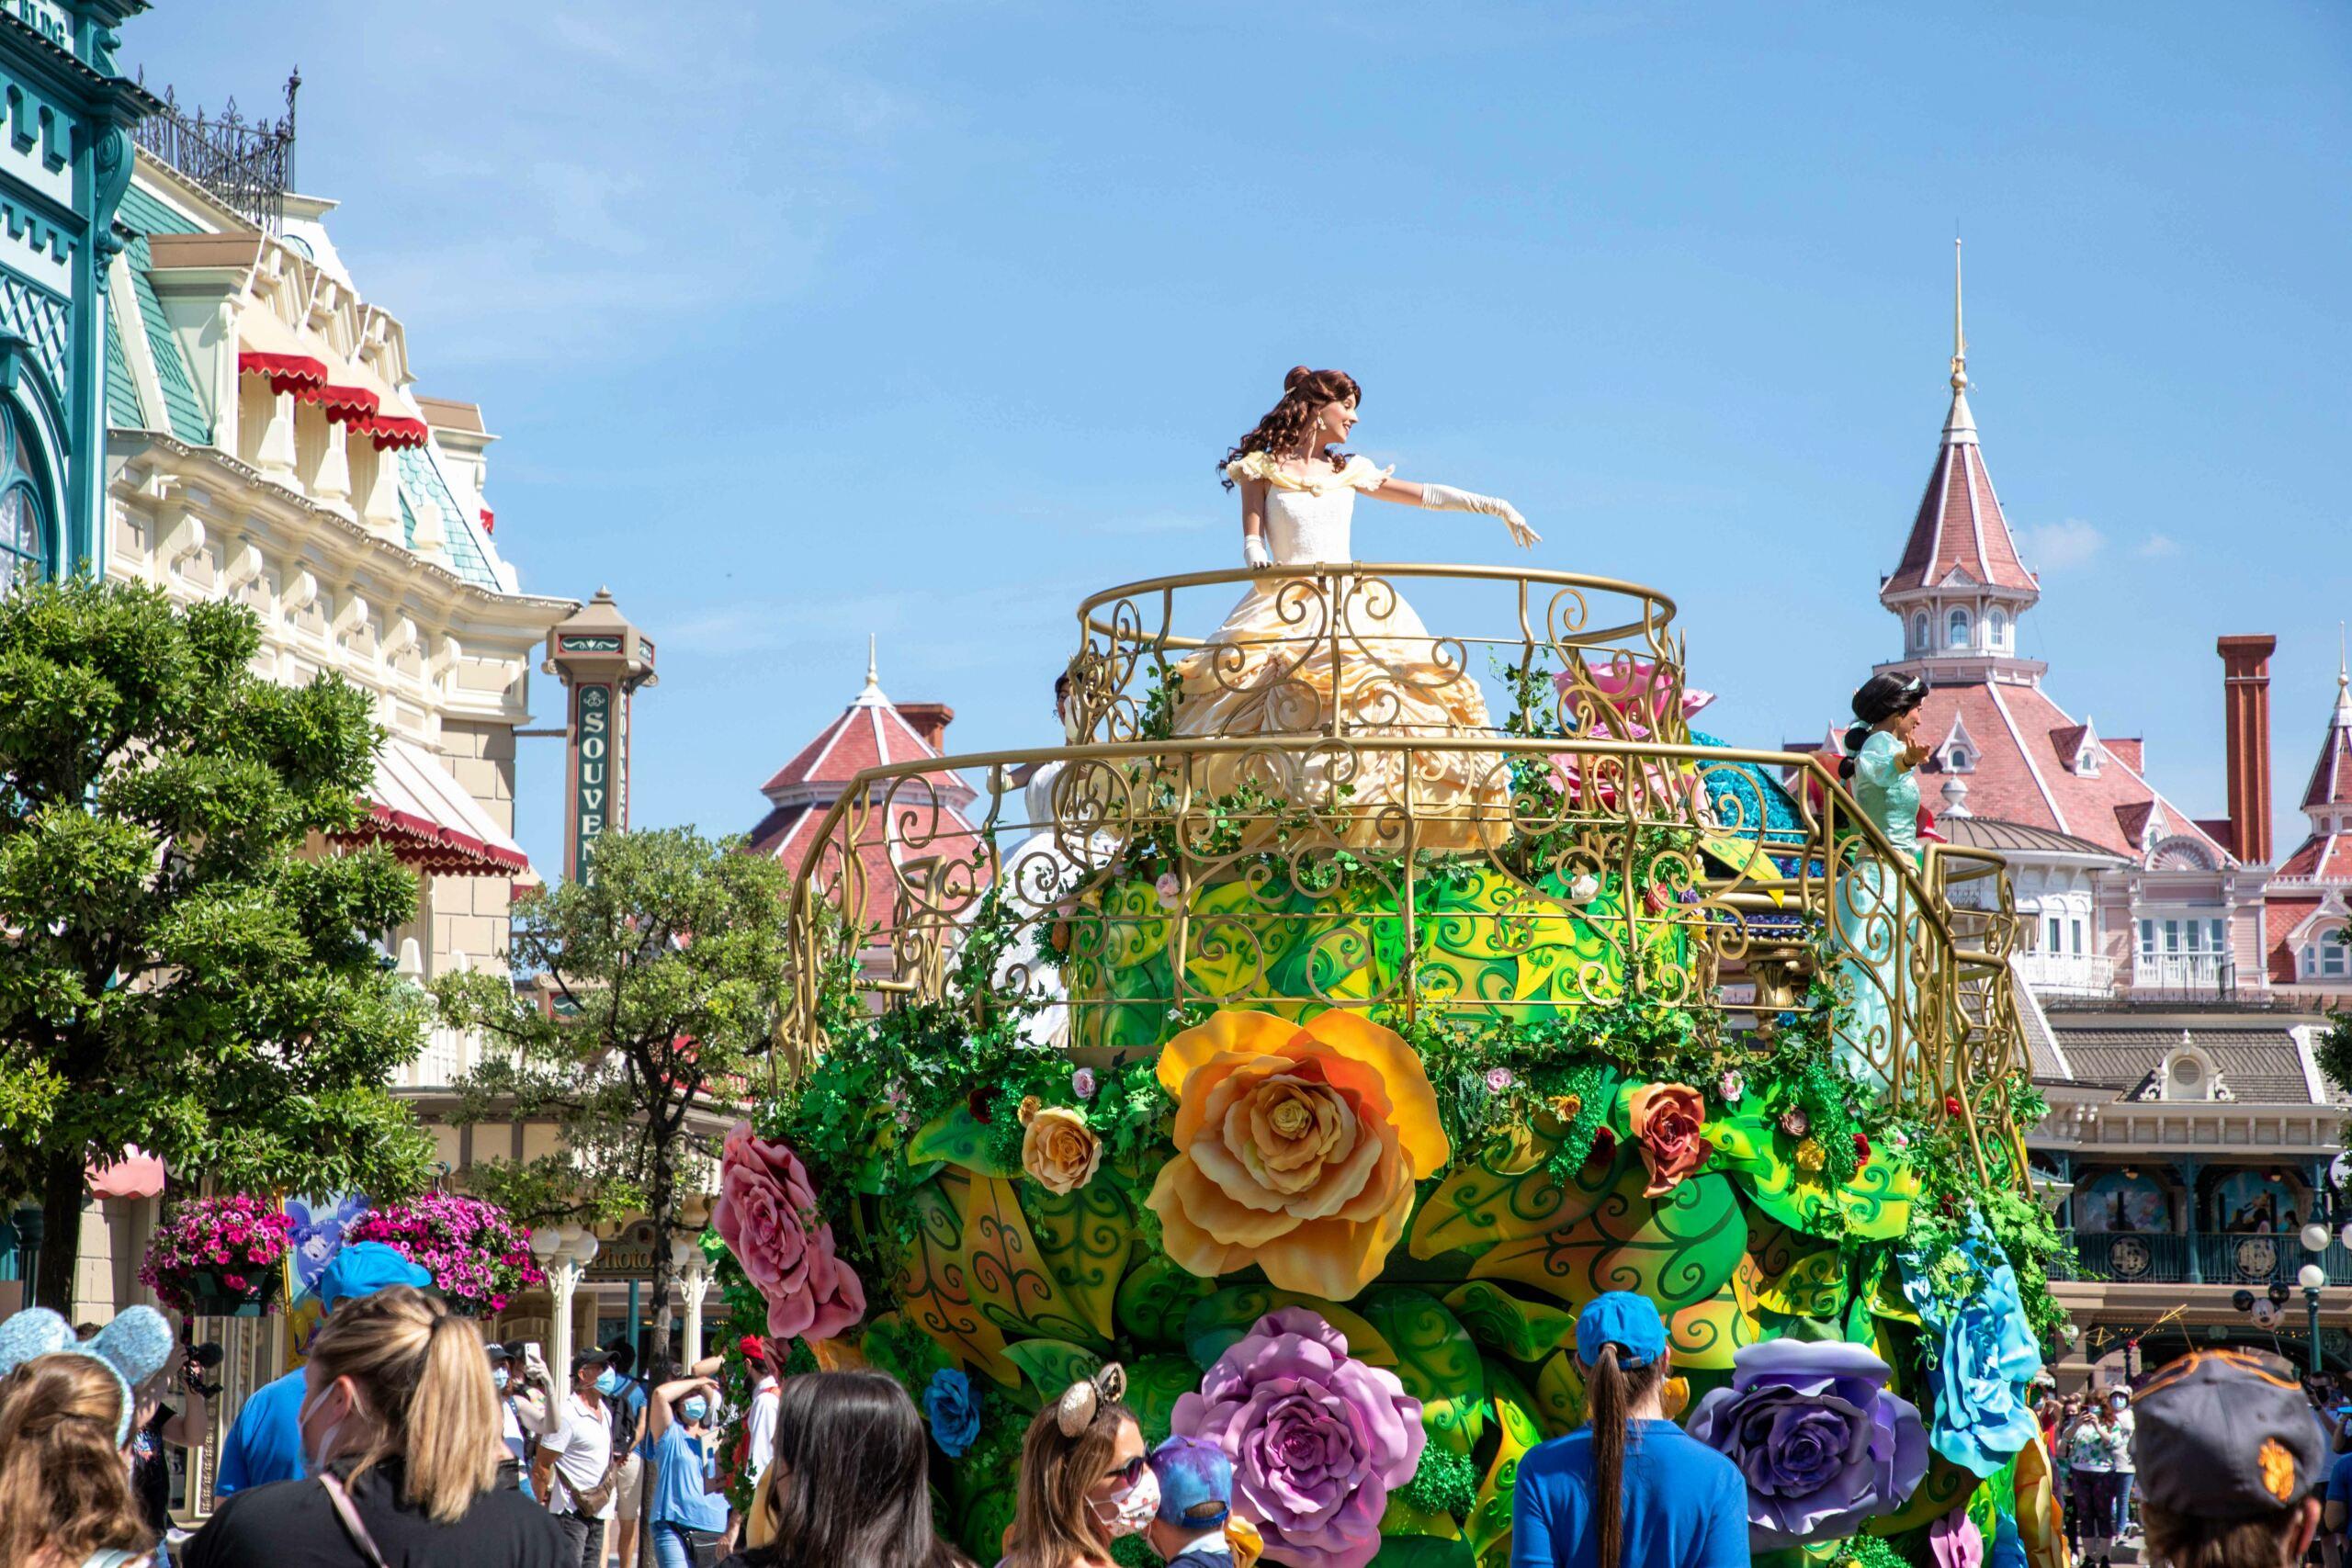 Riapertura di Disneyland Paris - Pagina 12 Enchan12